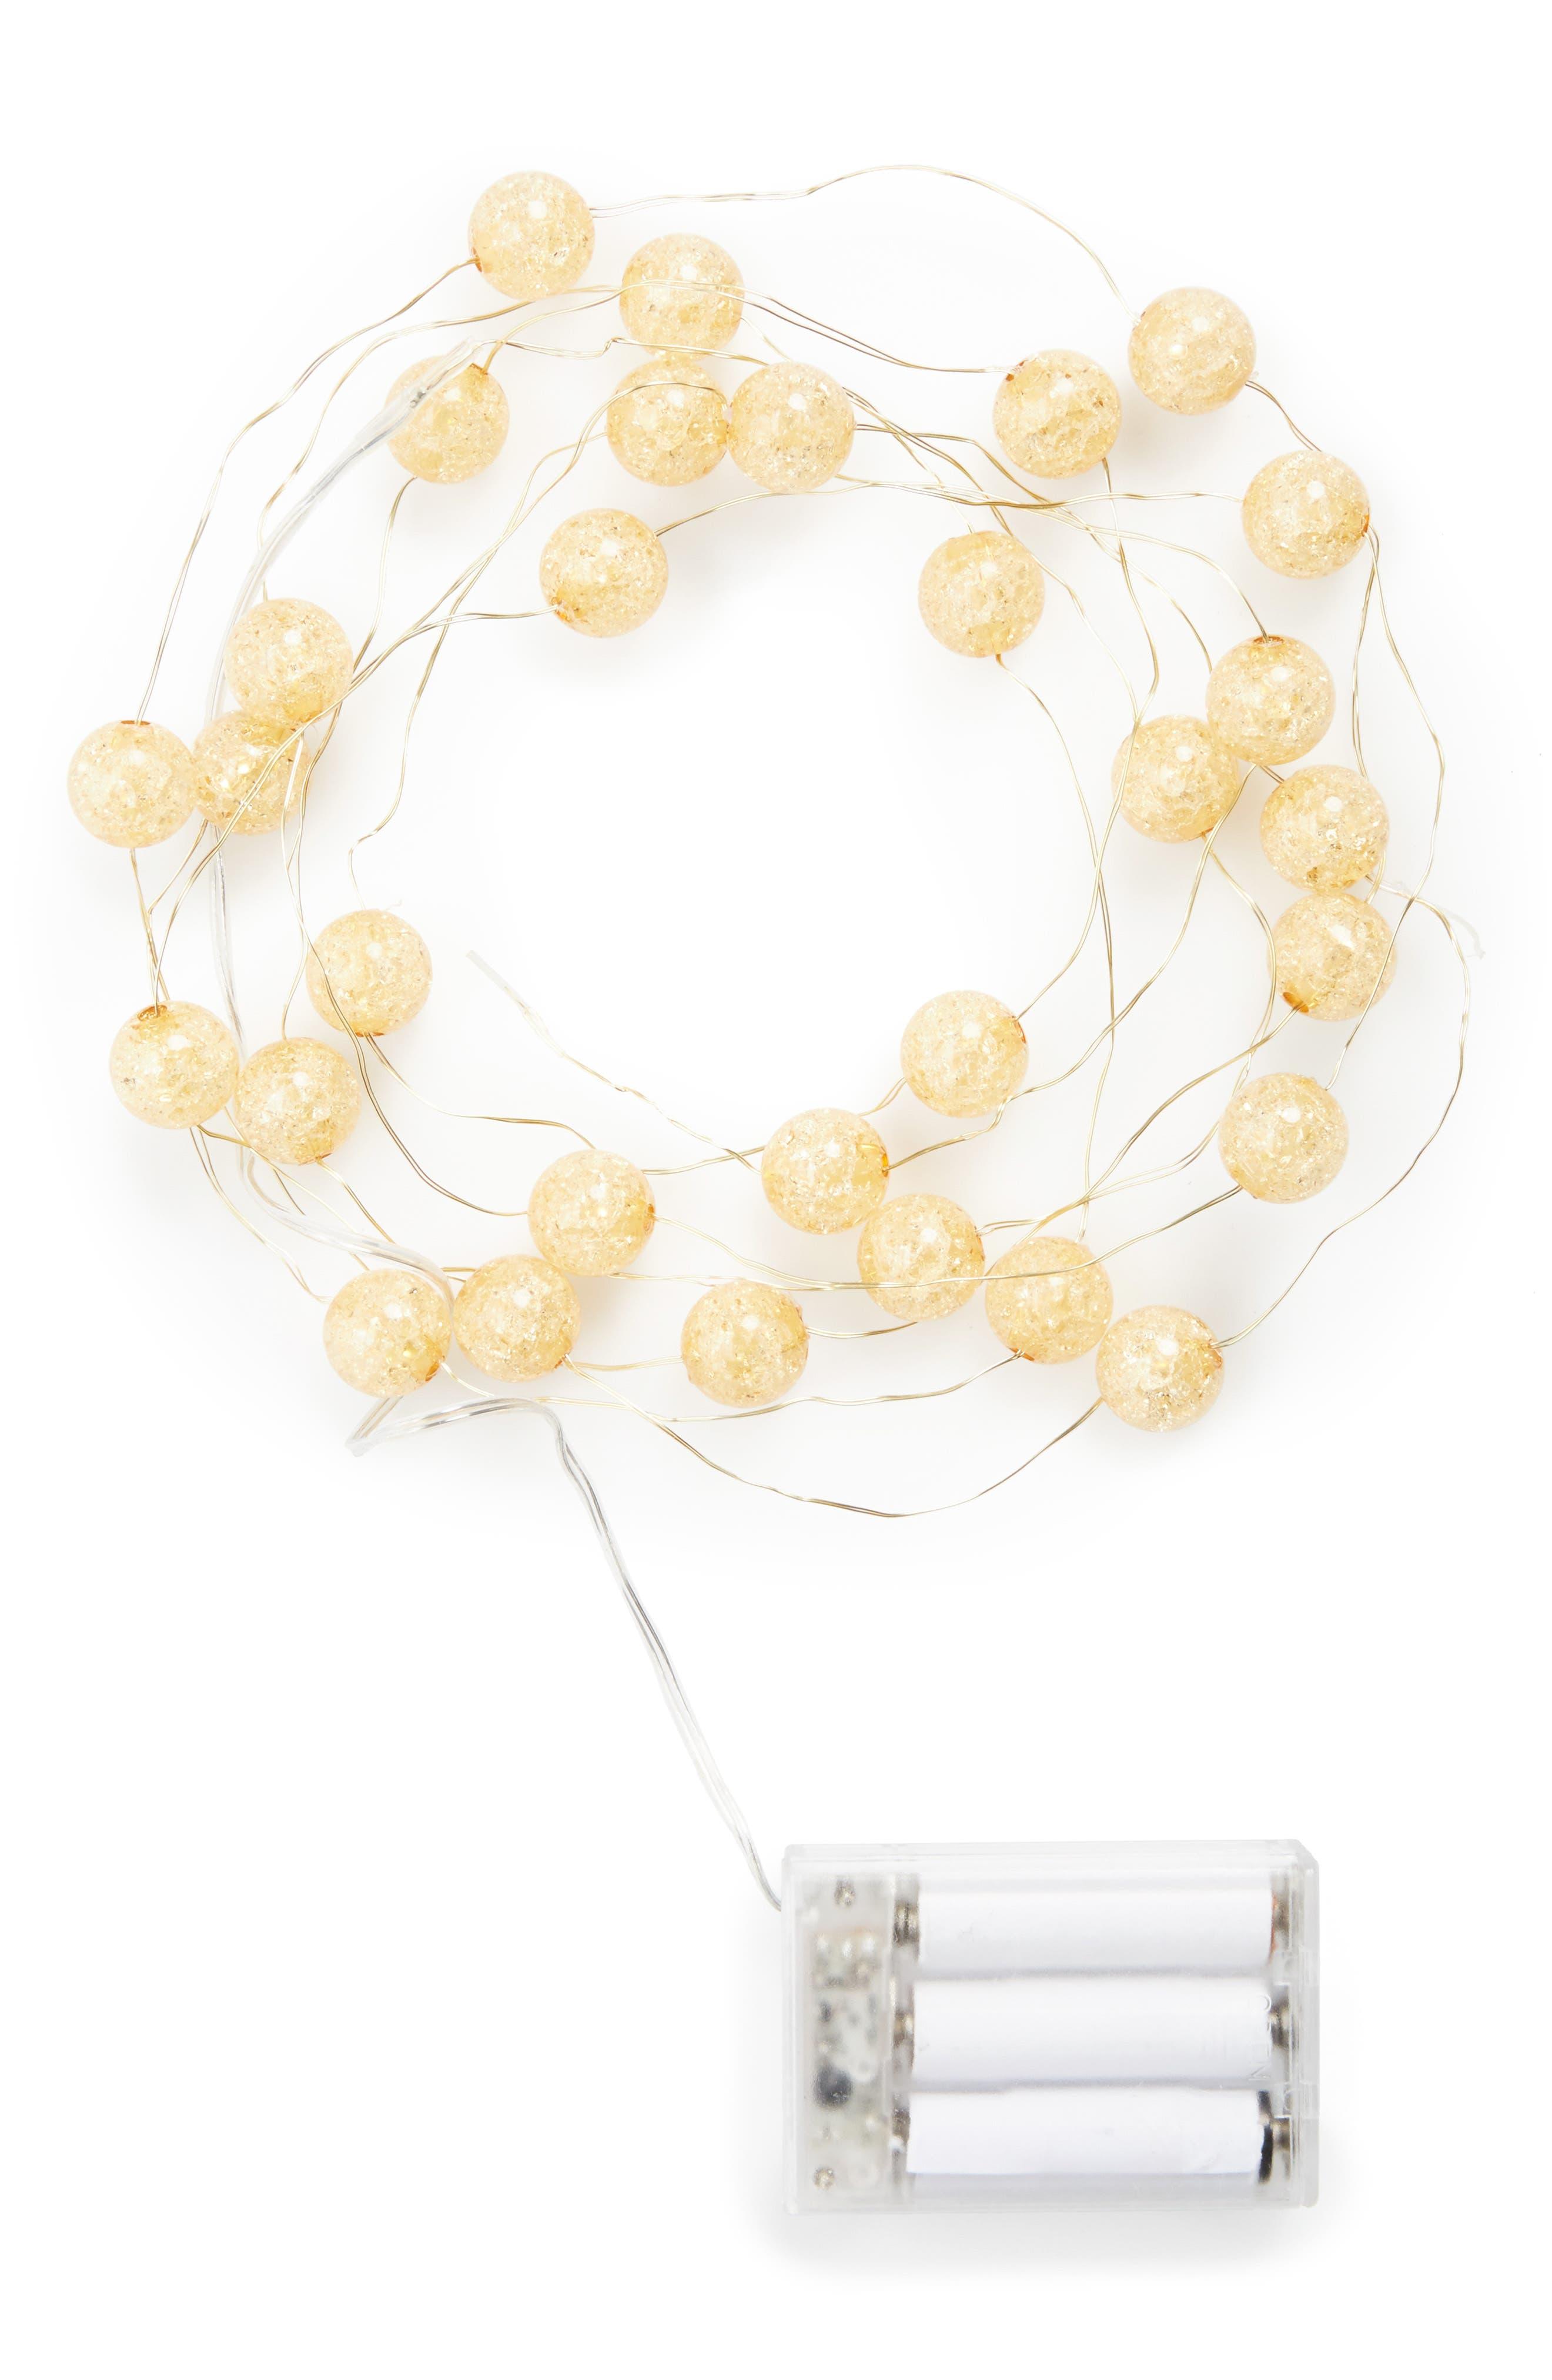 Main Image - Arty 'Crackle' Ball Lights